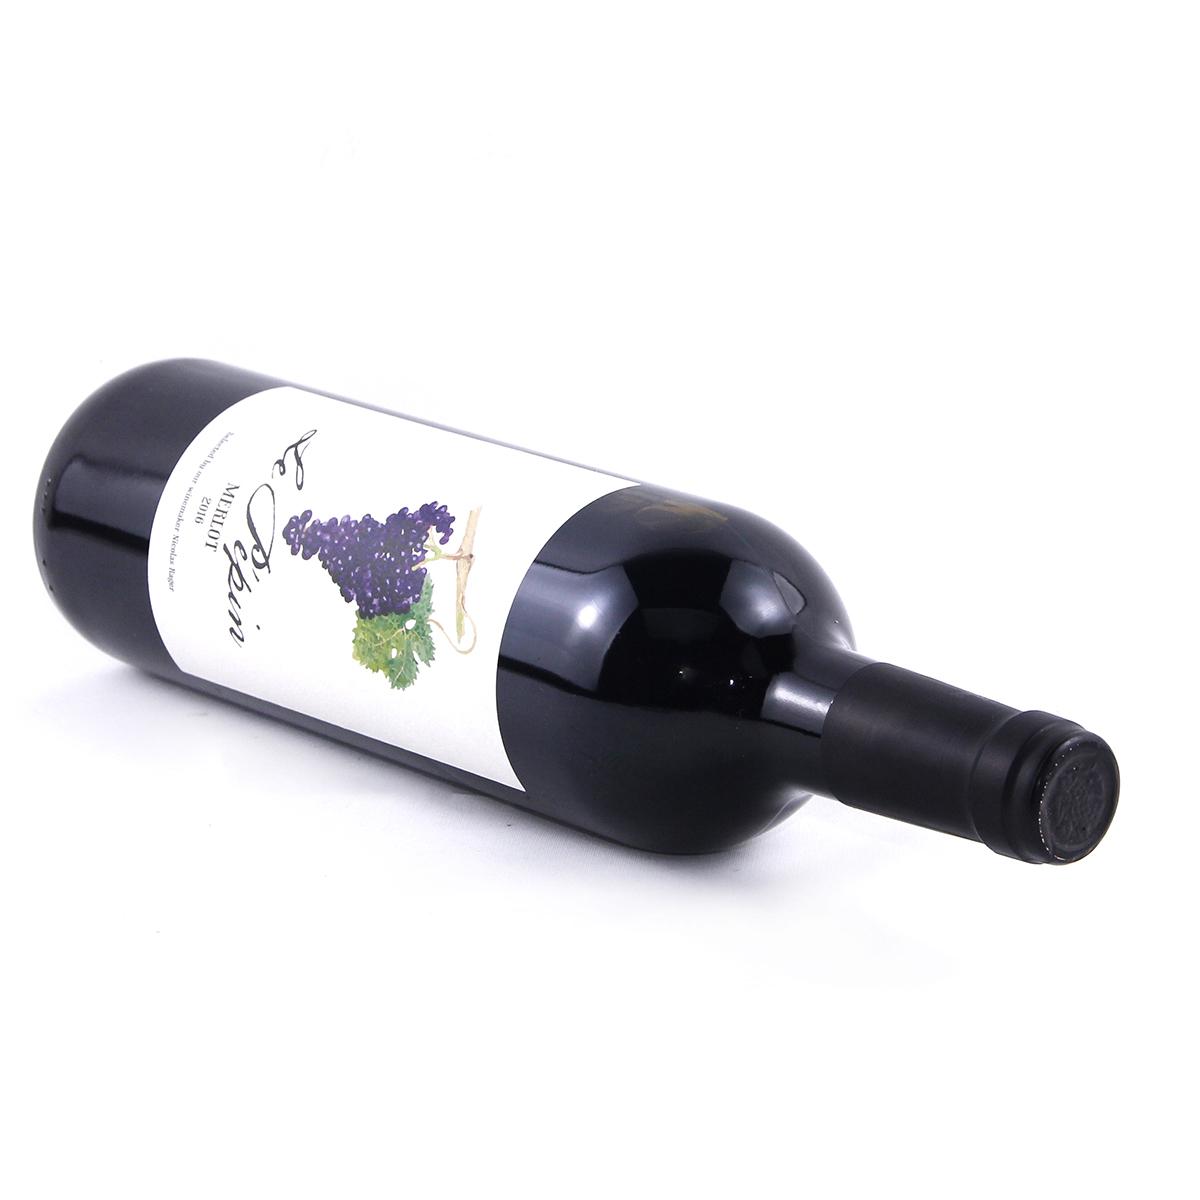 法国Chateau des Sources乐朋庄园梅洛VDF干红葡萄酒